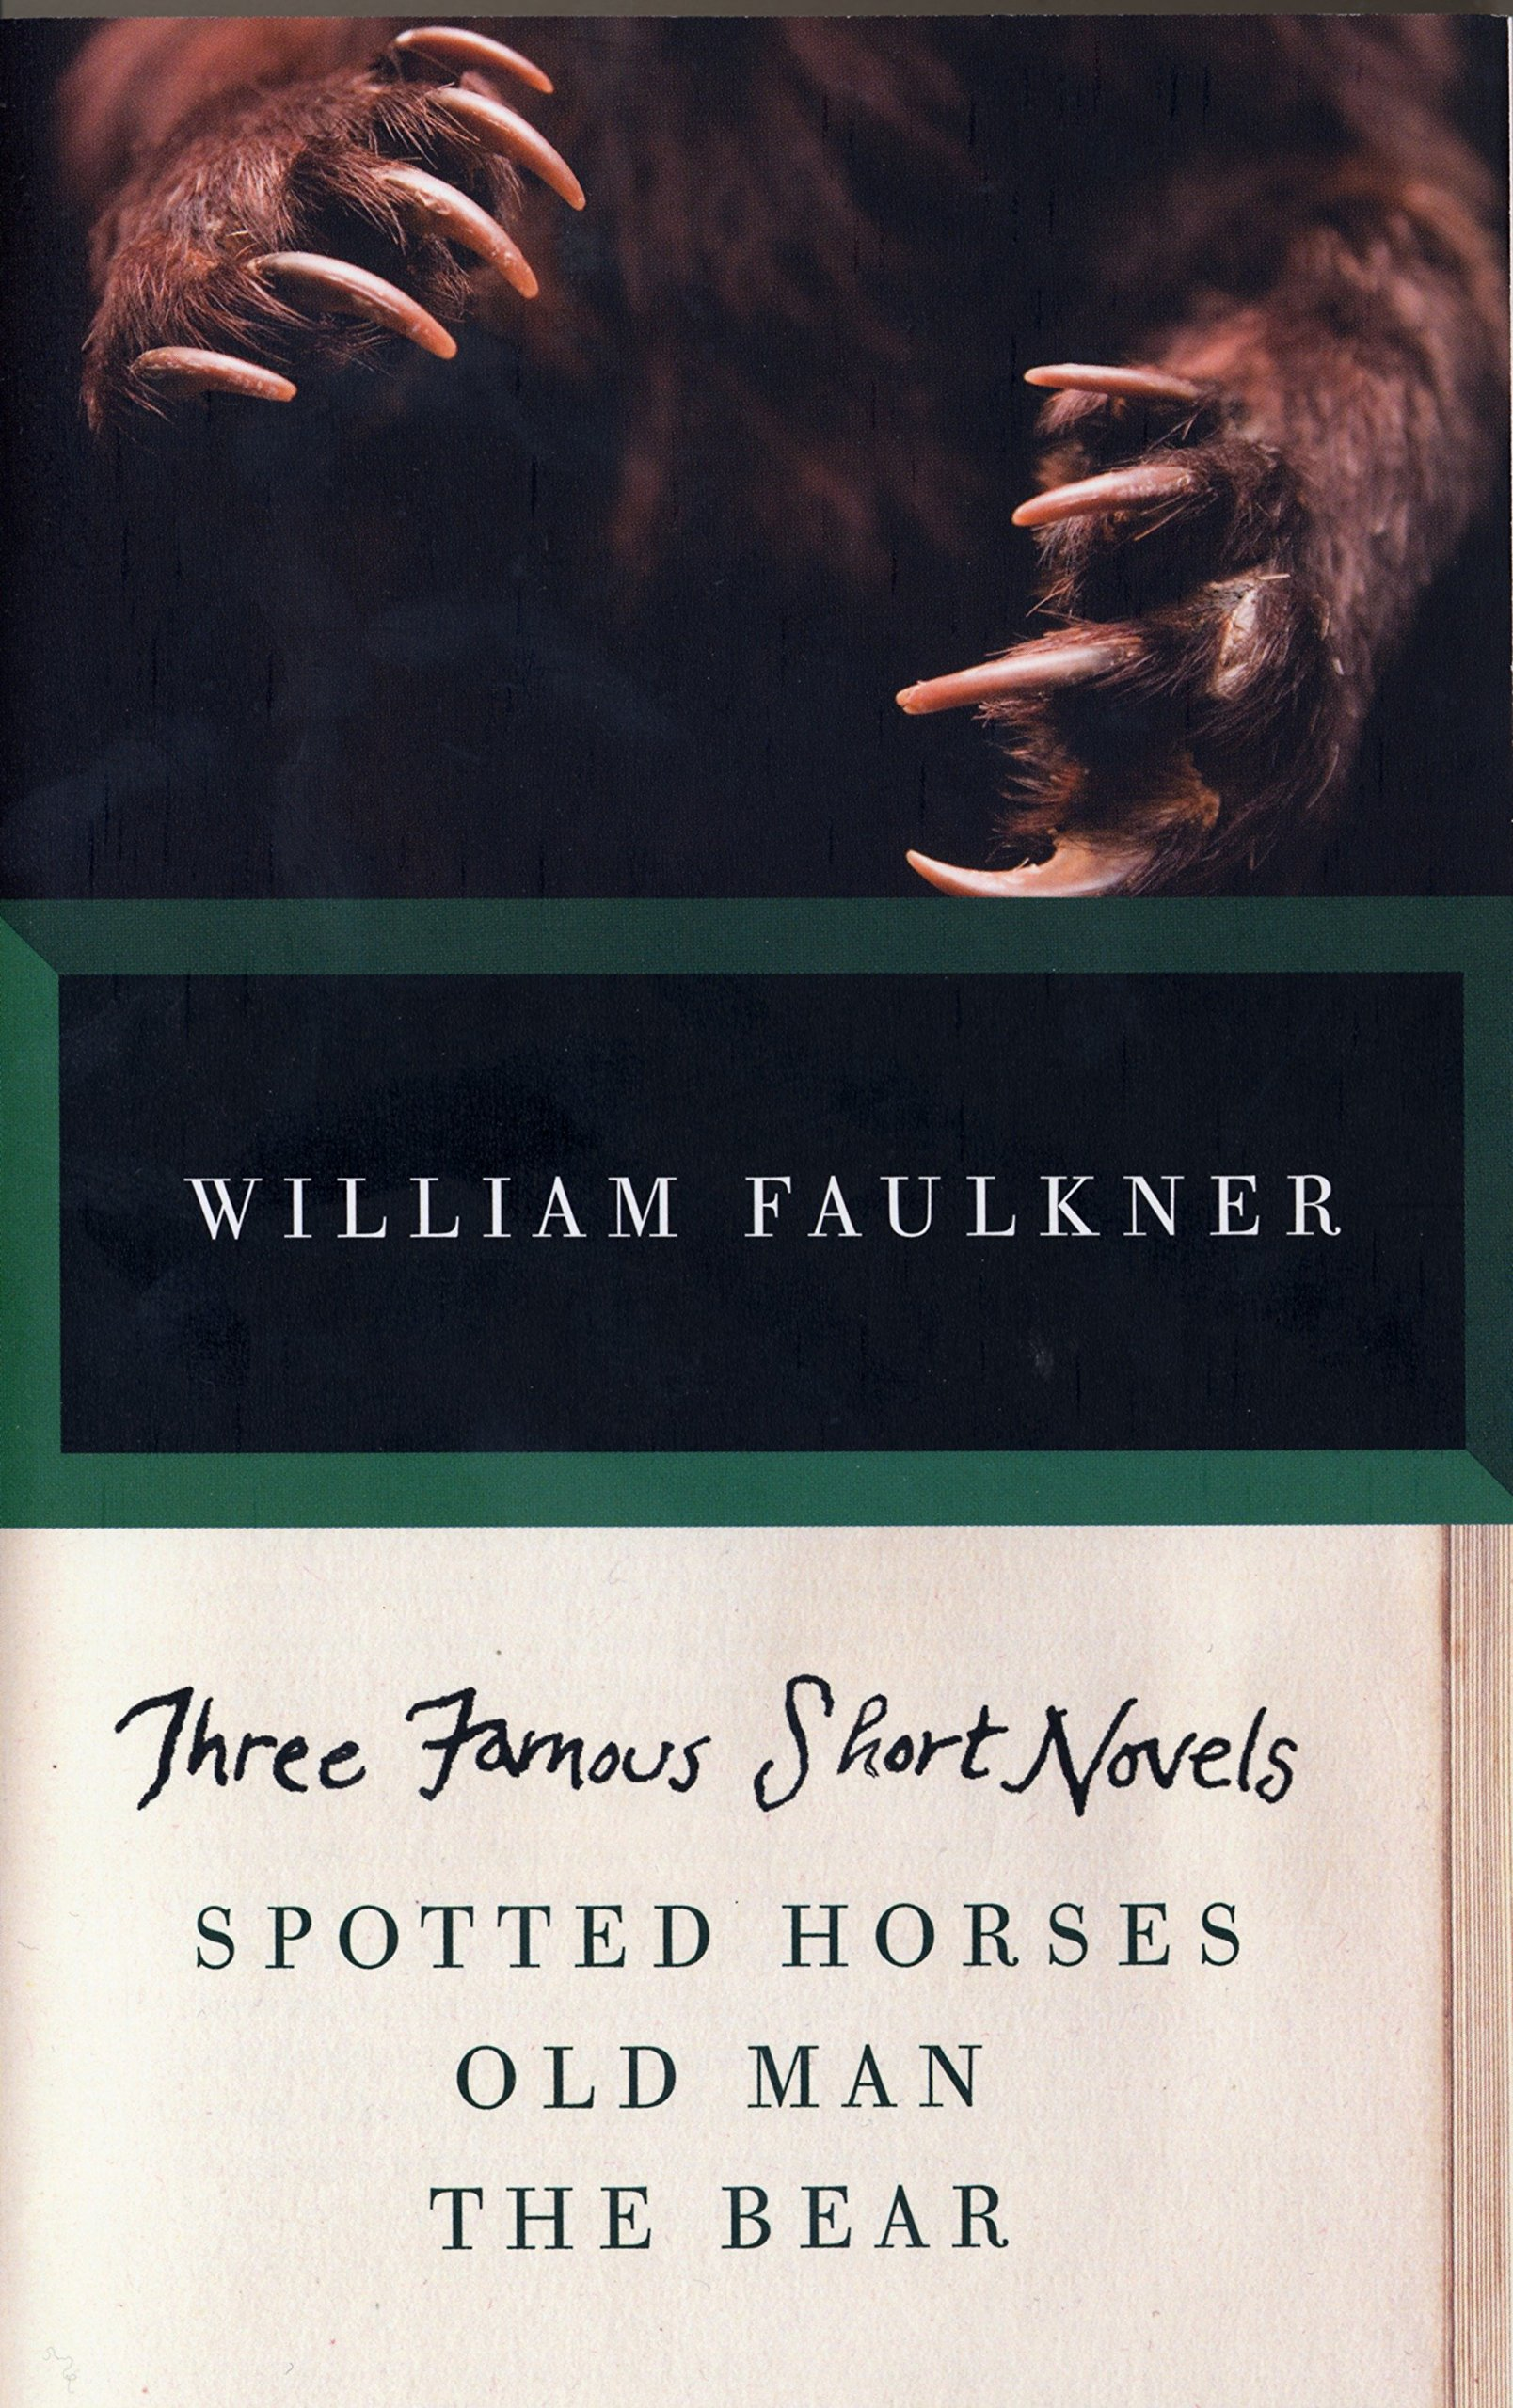 spotted horses faulkner summary